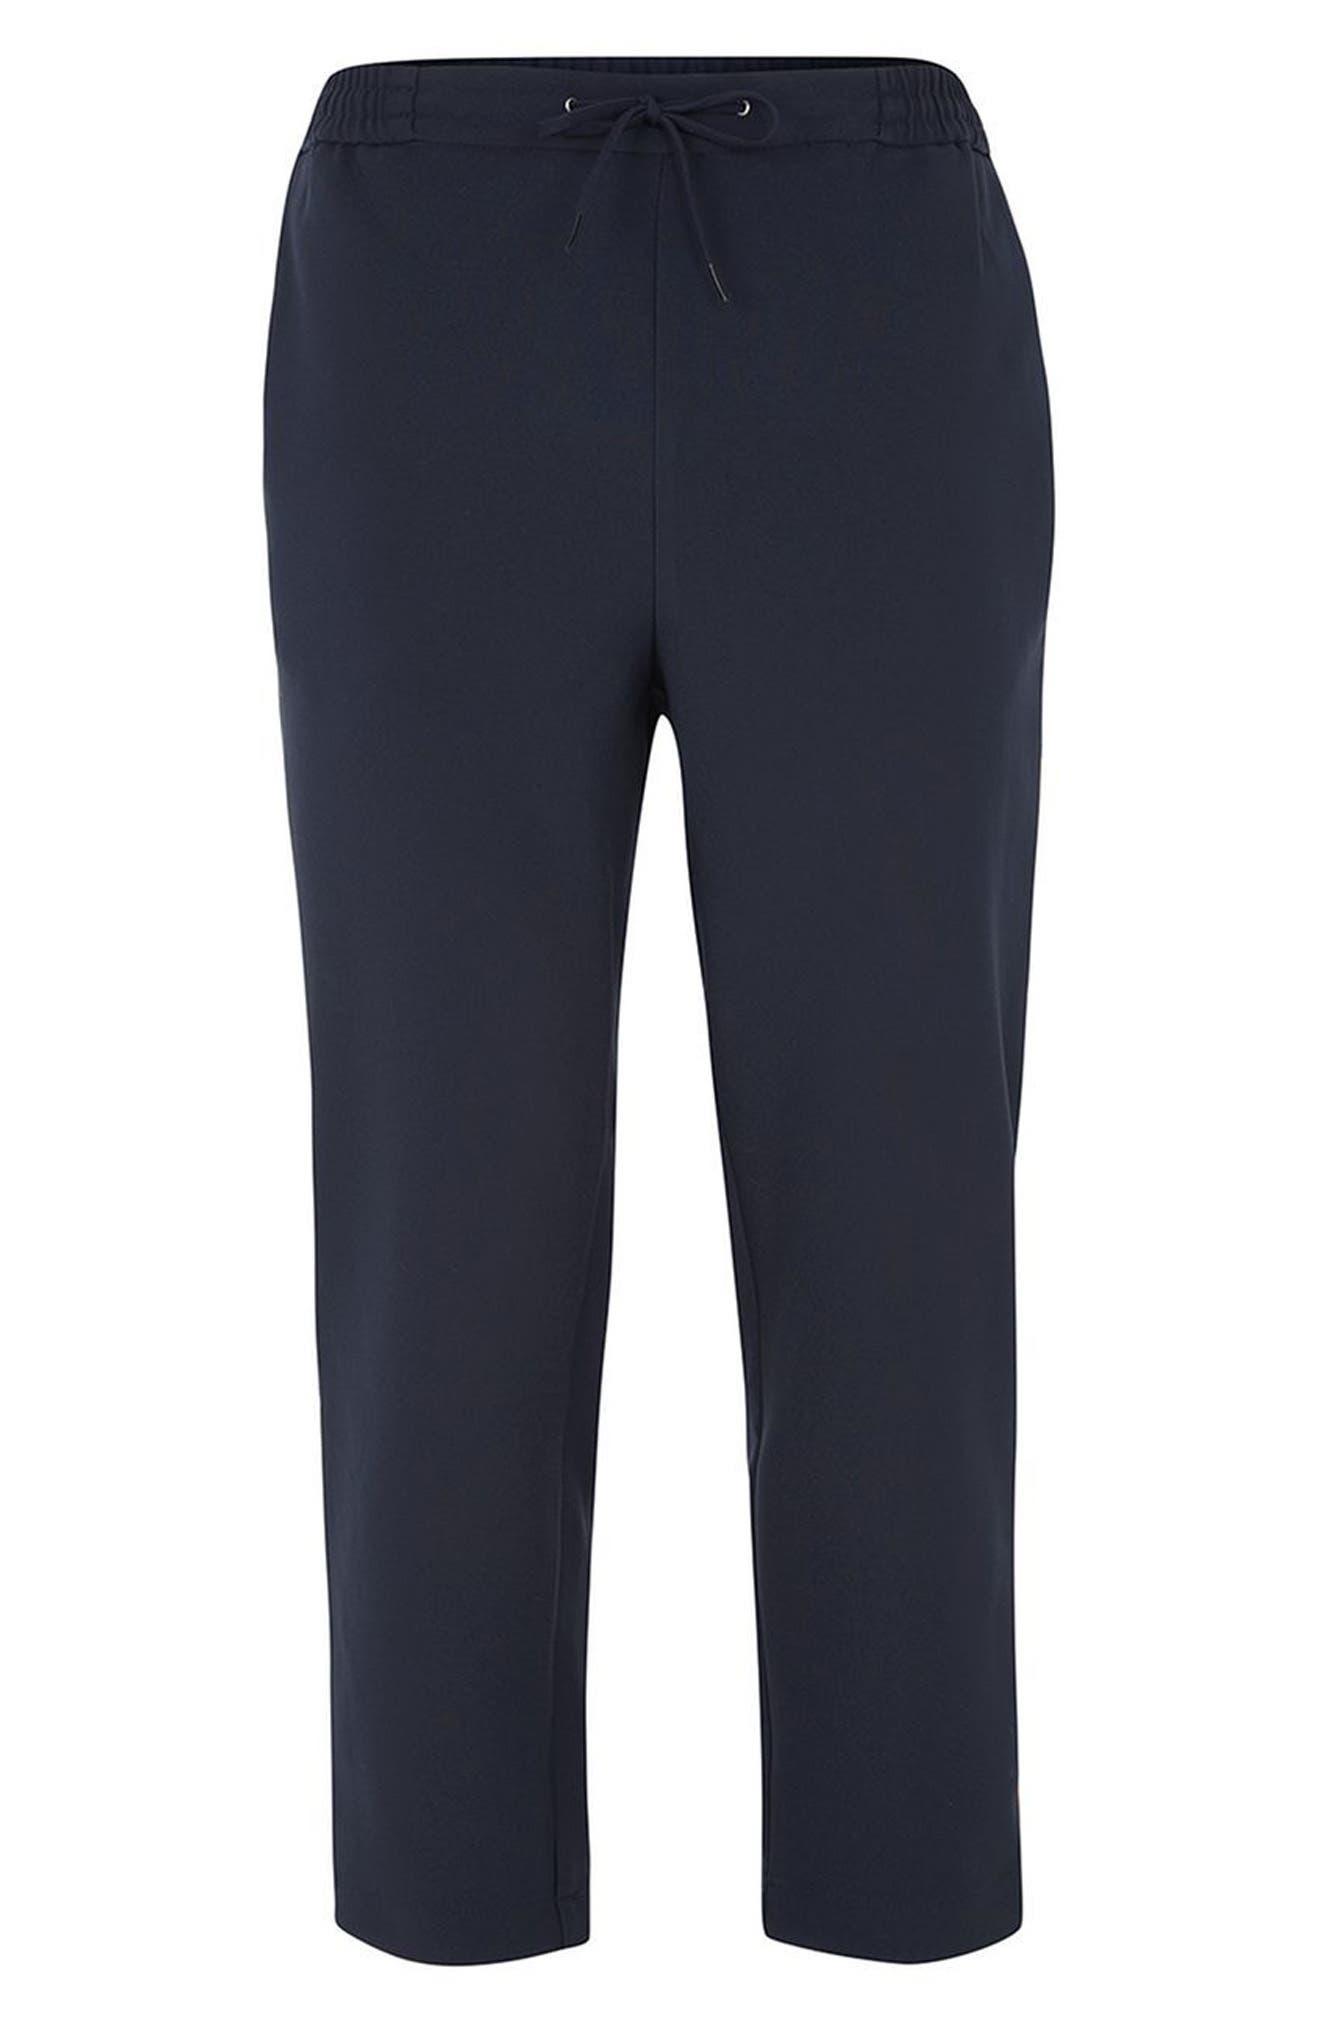 Cropped Slim Fit Jogger Pants,                             Alternate thumbnail 4, color,                             401